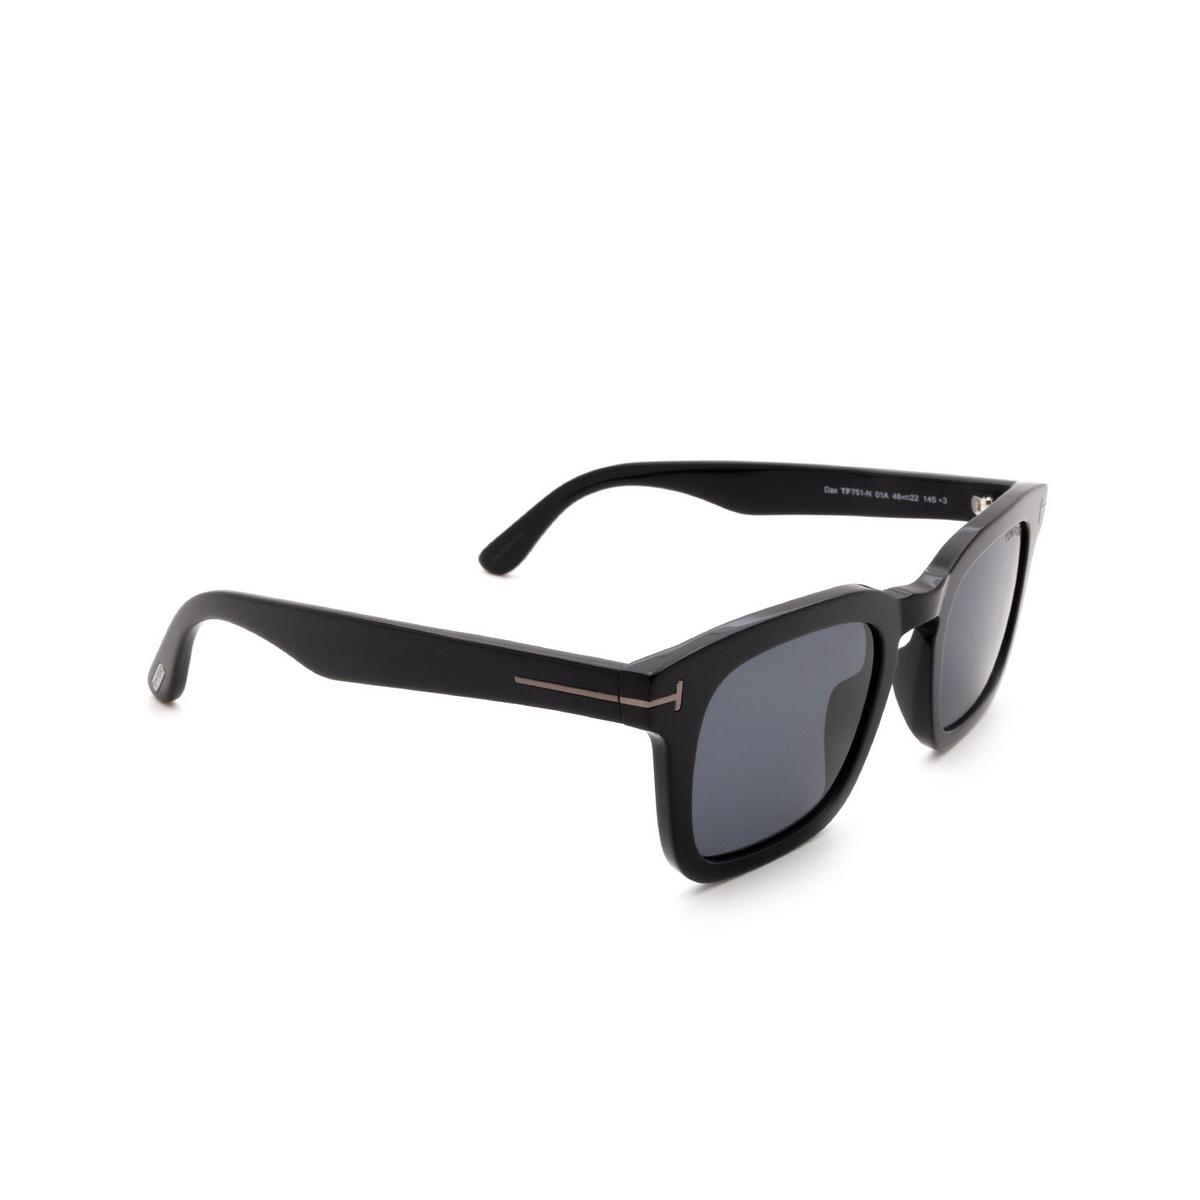 Tom Ford® Square Sunglasses: Dax FT0751-N color Shiny Black 01A - three-quarters view.